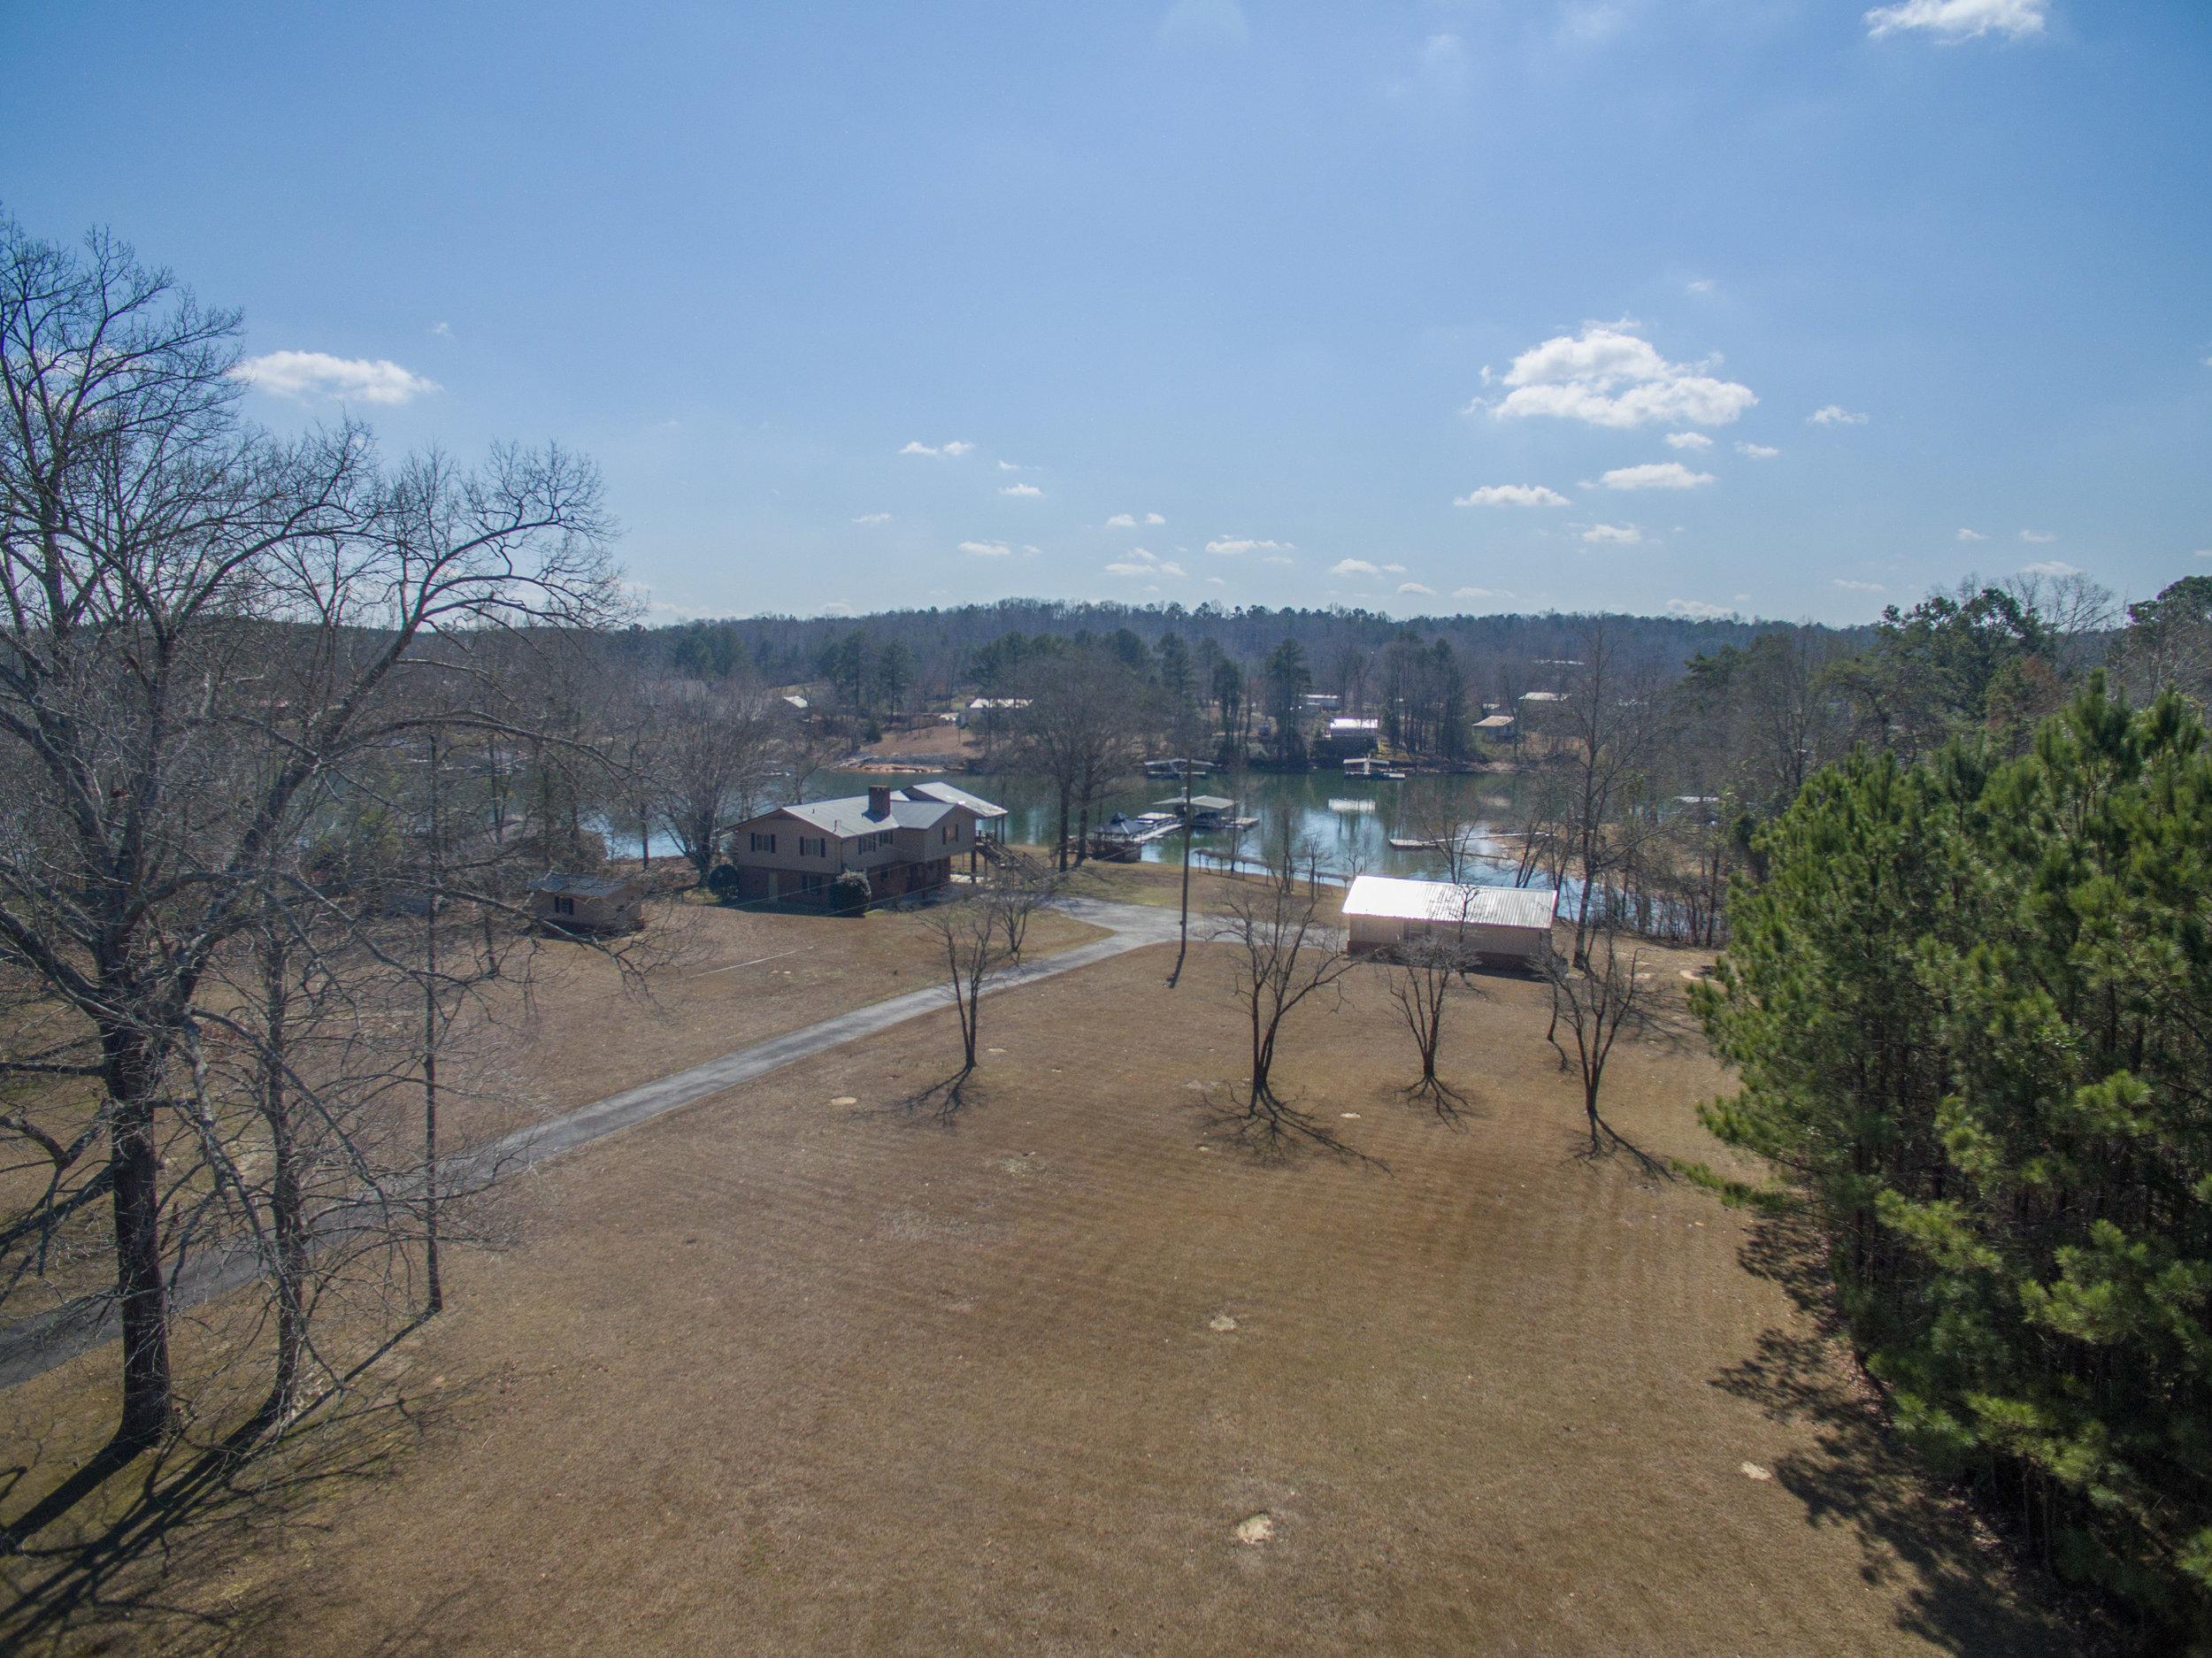 dave-warren-cullman-aerial-real-estate-photography-justin-dyar-1.jpg